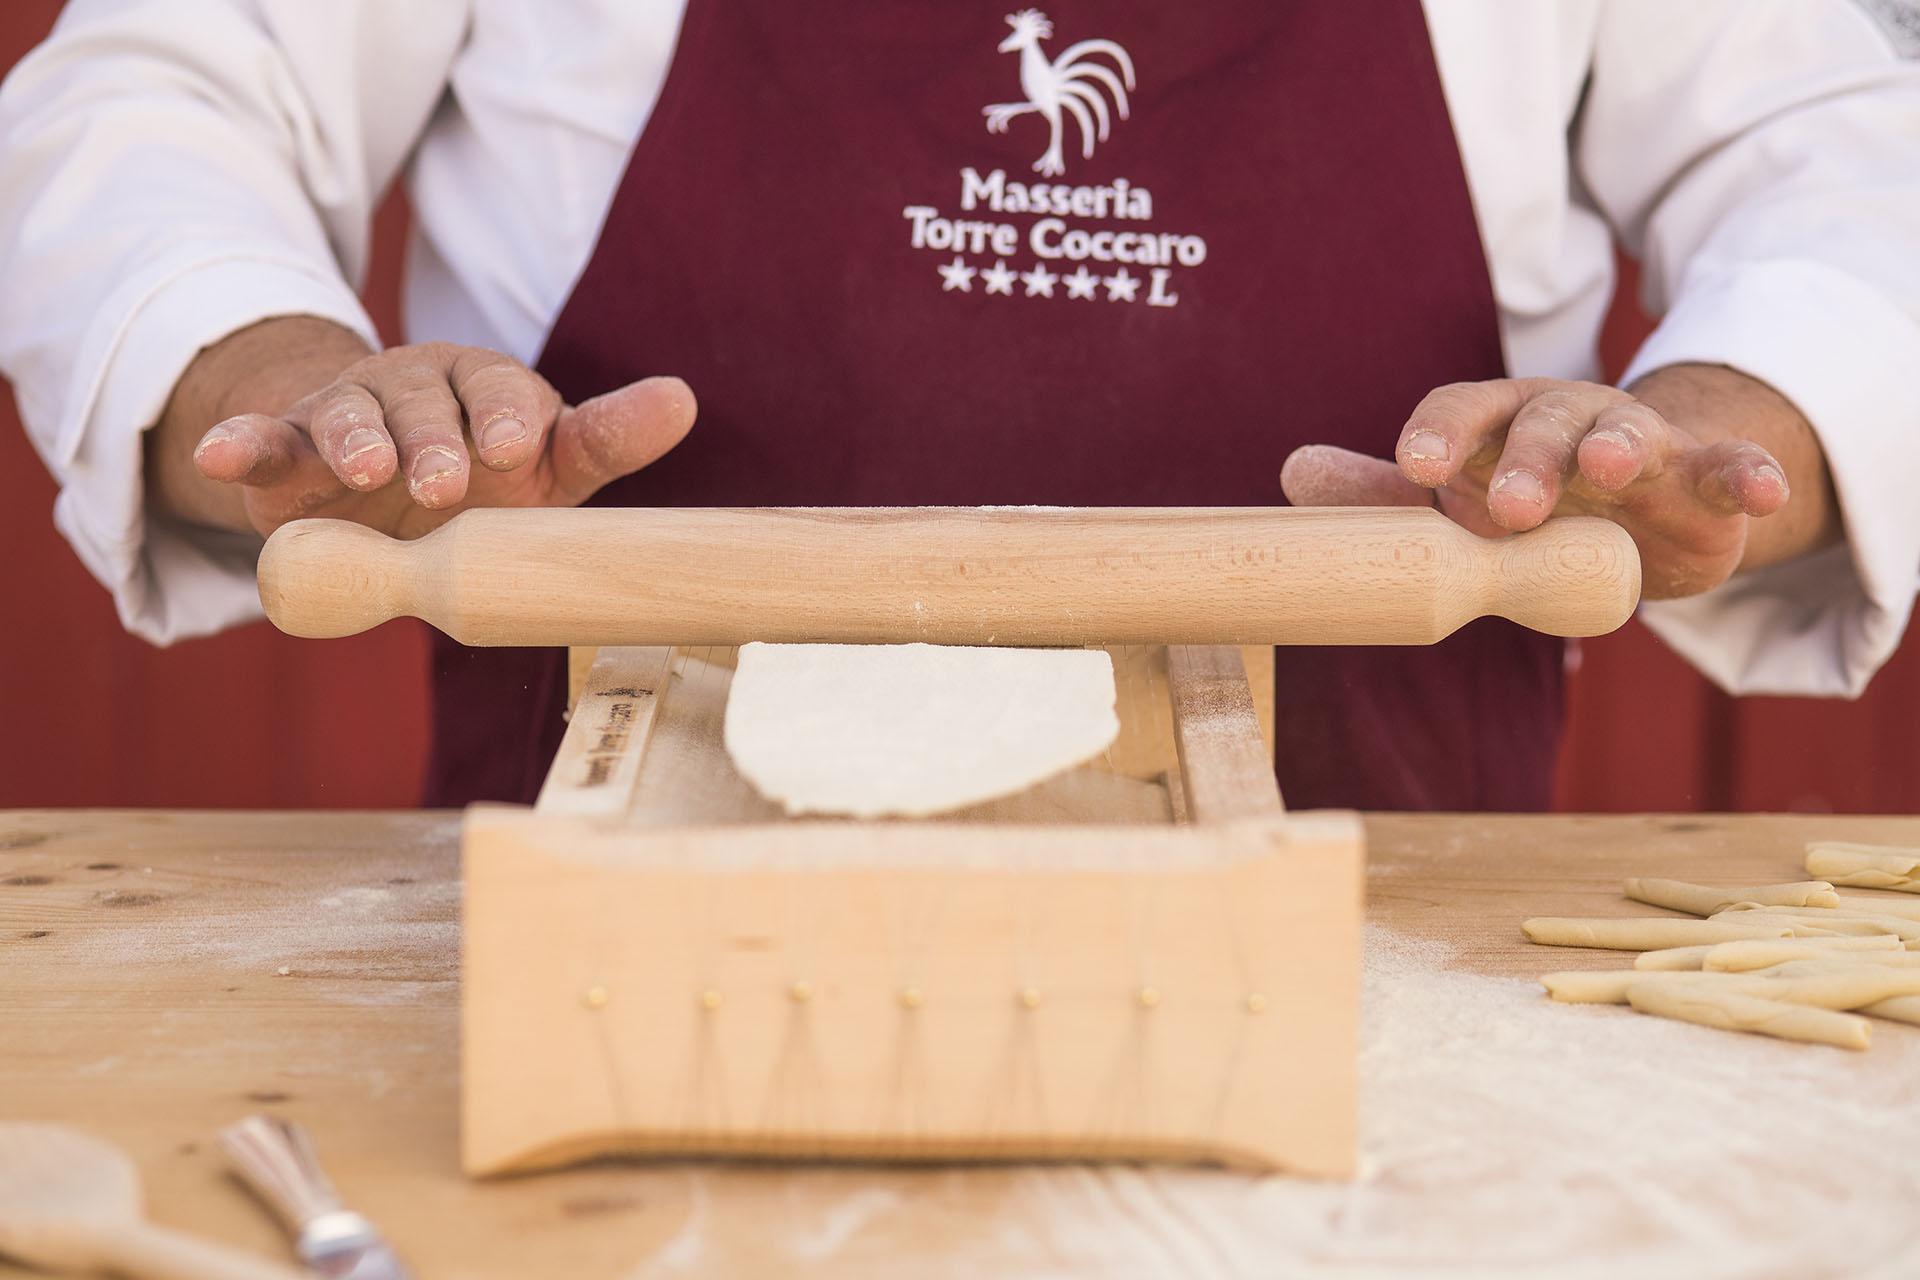 Kit Master Pasta Chef